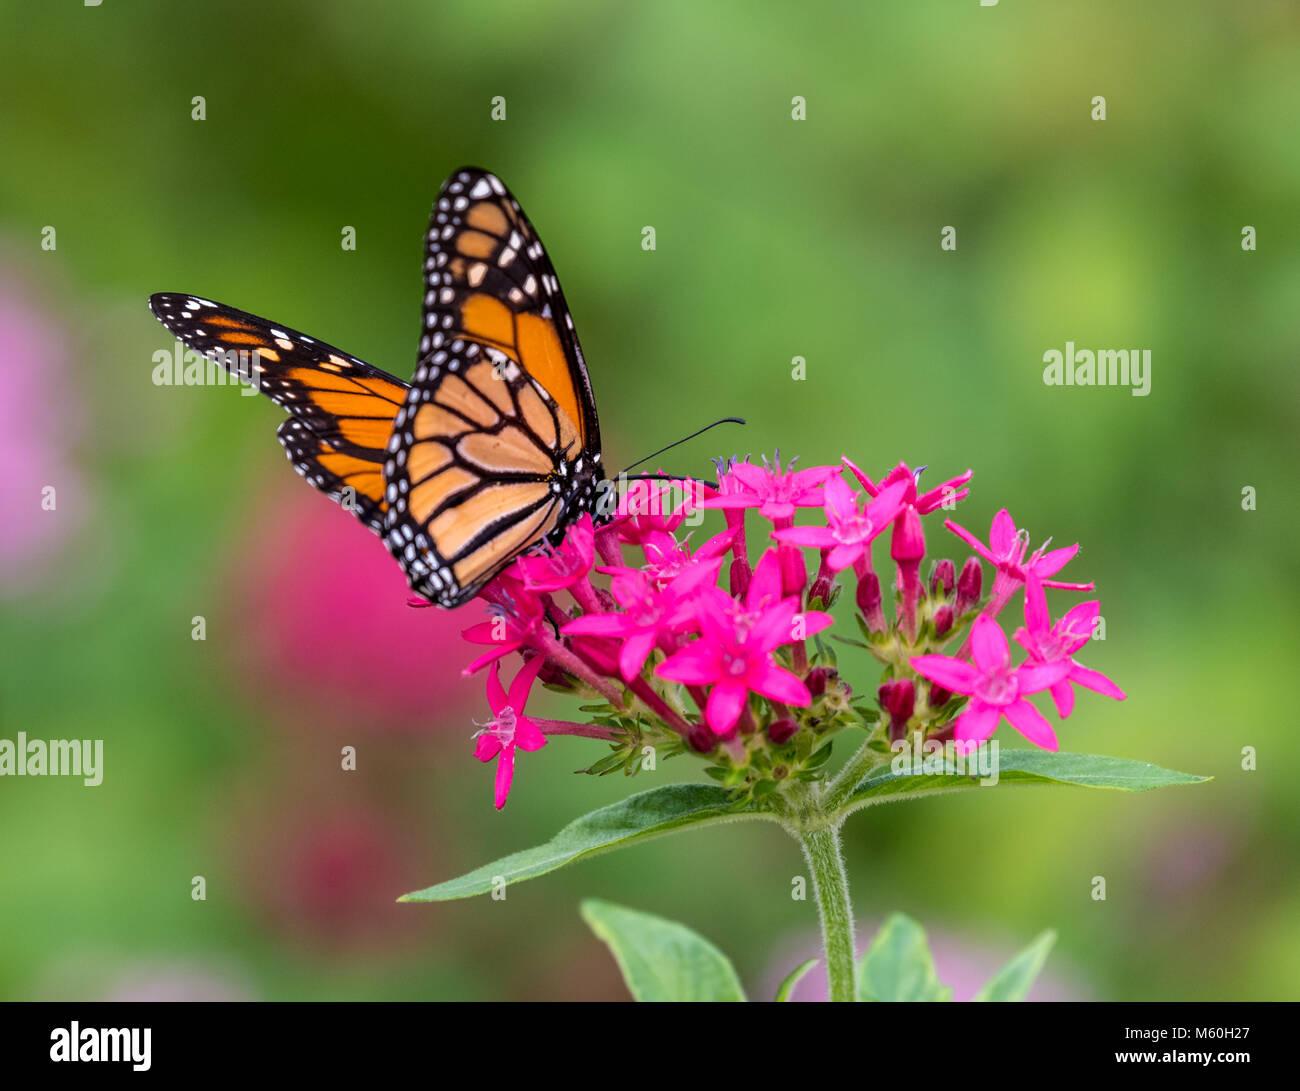 Monarch butterfly feeding on Milkweed flowers Stock Photo